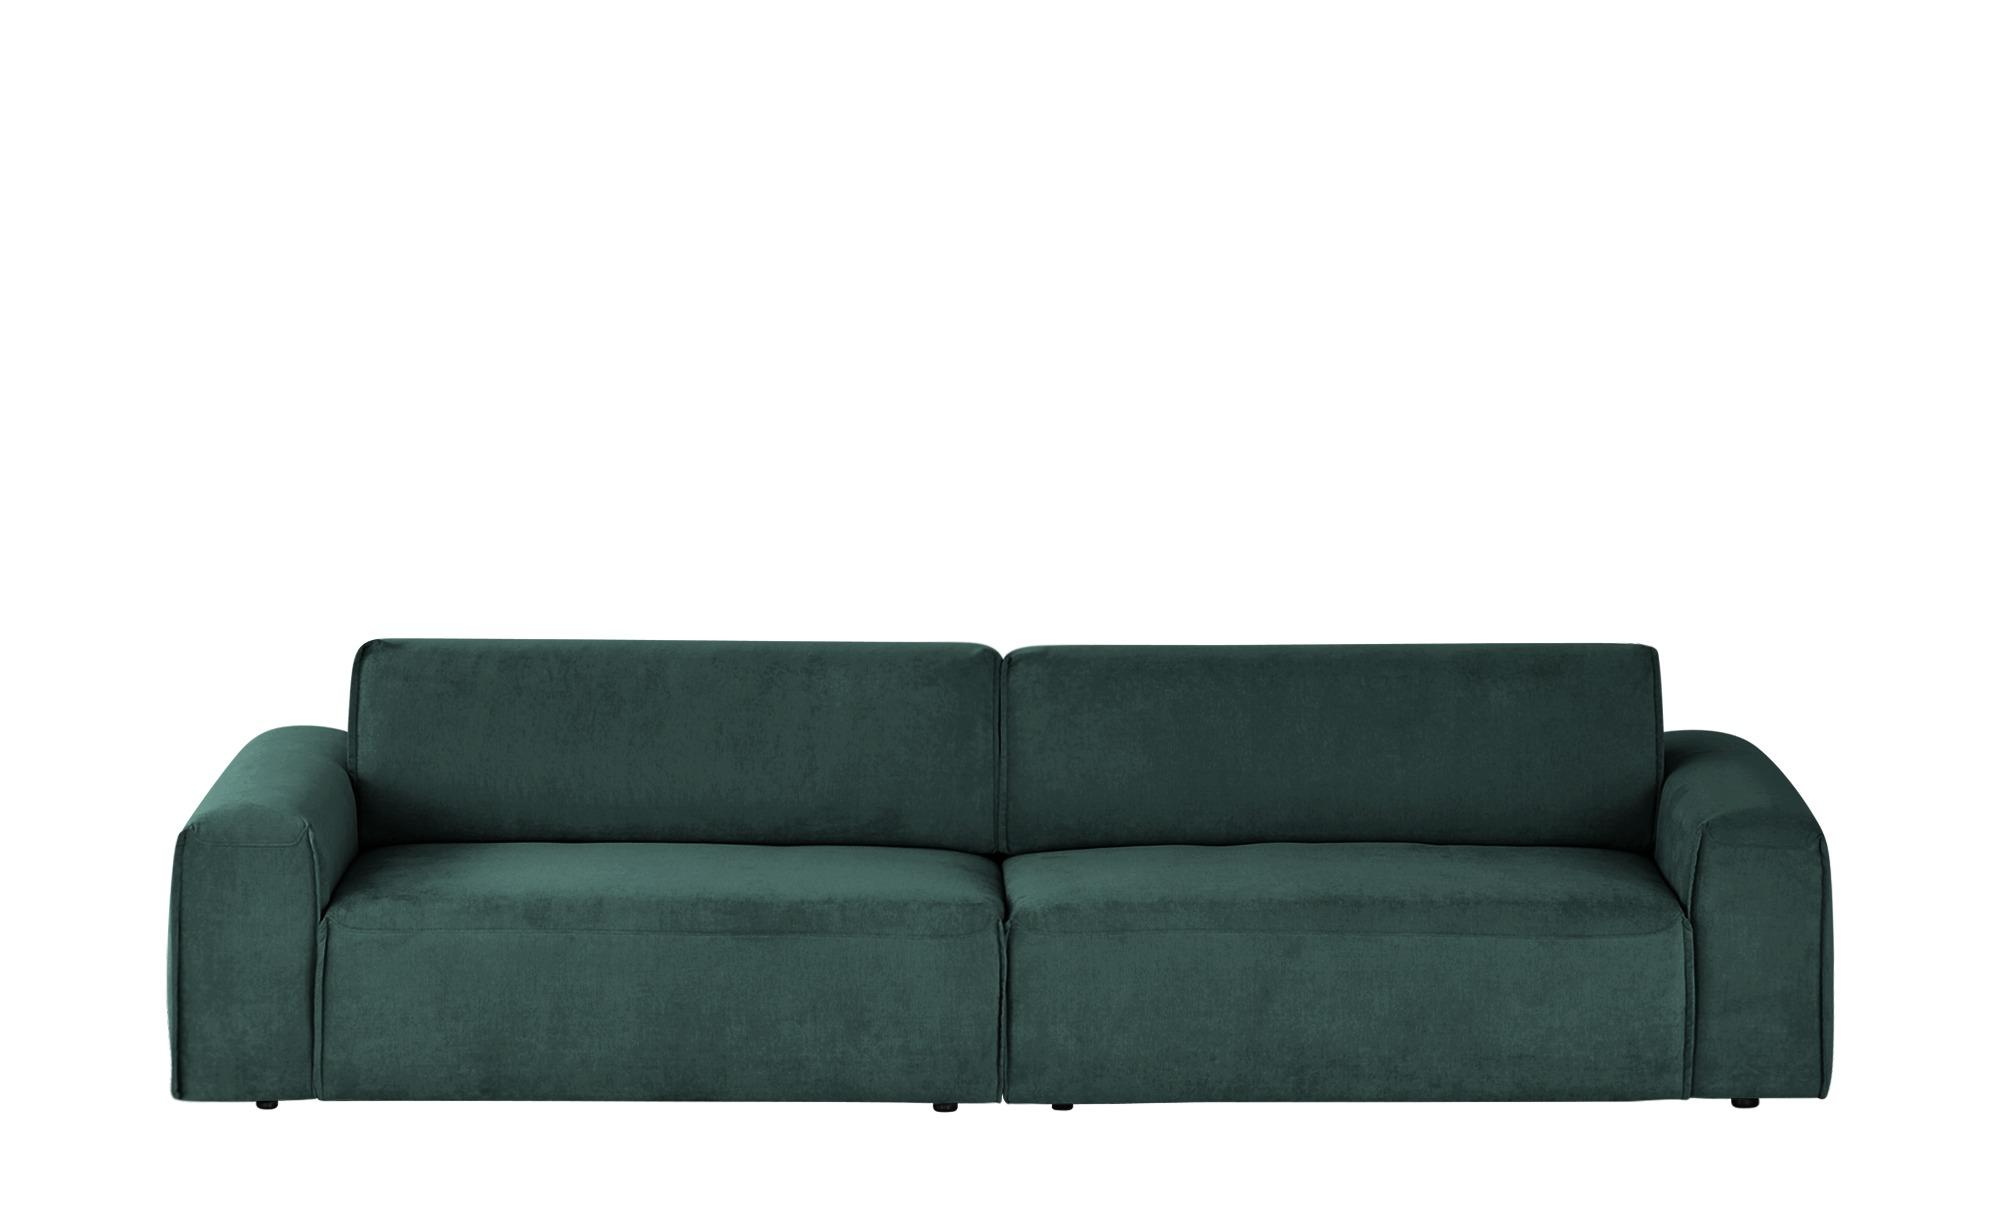 Max Schelling Big Sofa  Life ¦ türkis/petrol ¦ Maße (cm): B: 296 T: 120 Polstermöbel > Sofas > Big-Sofas - Höffner